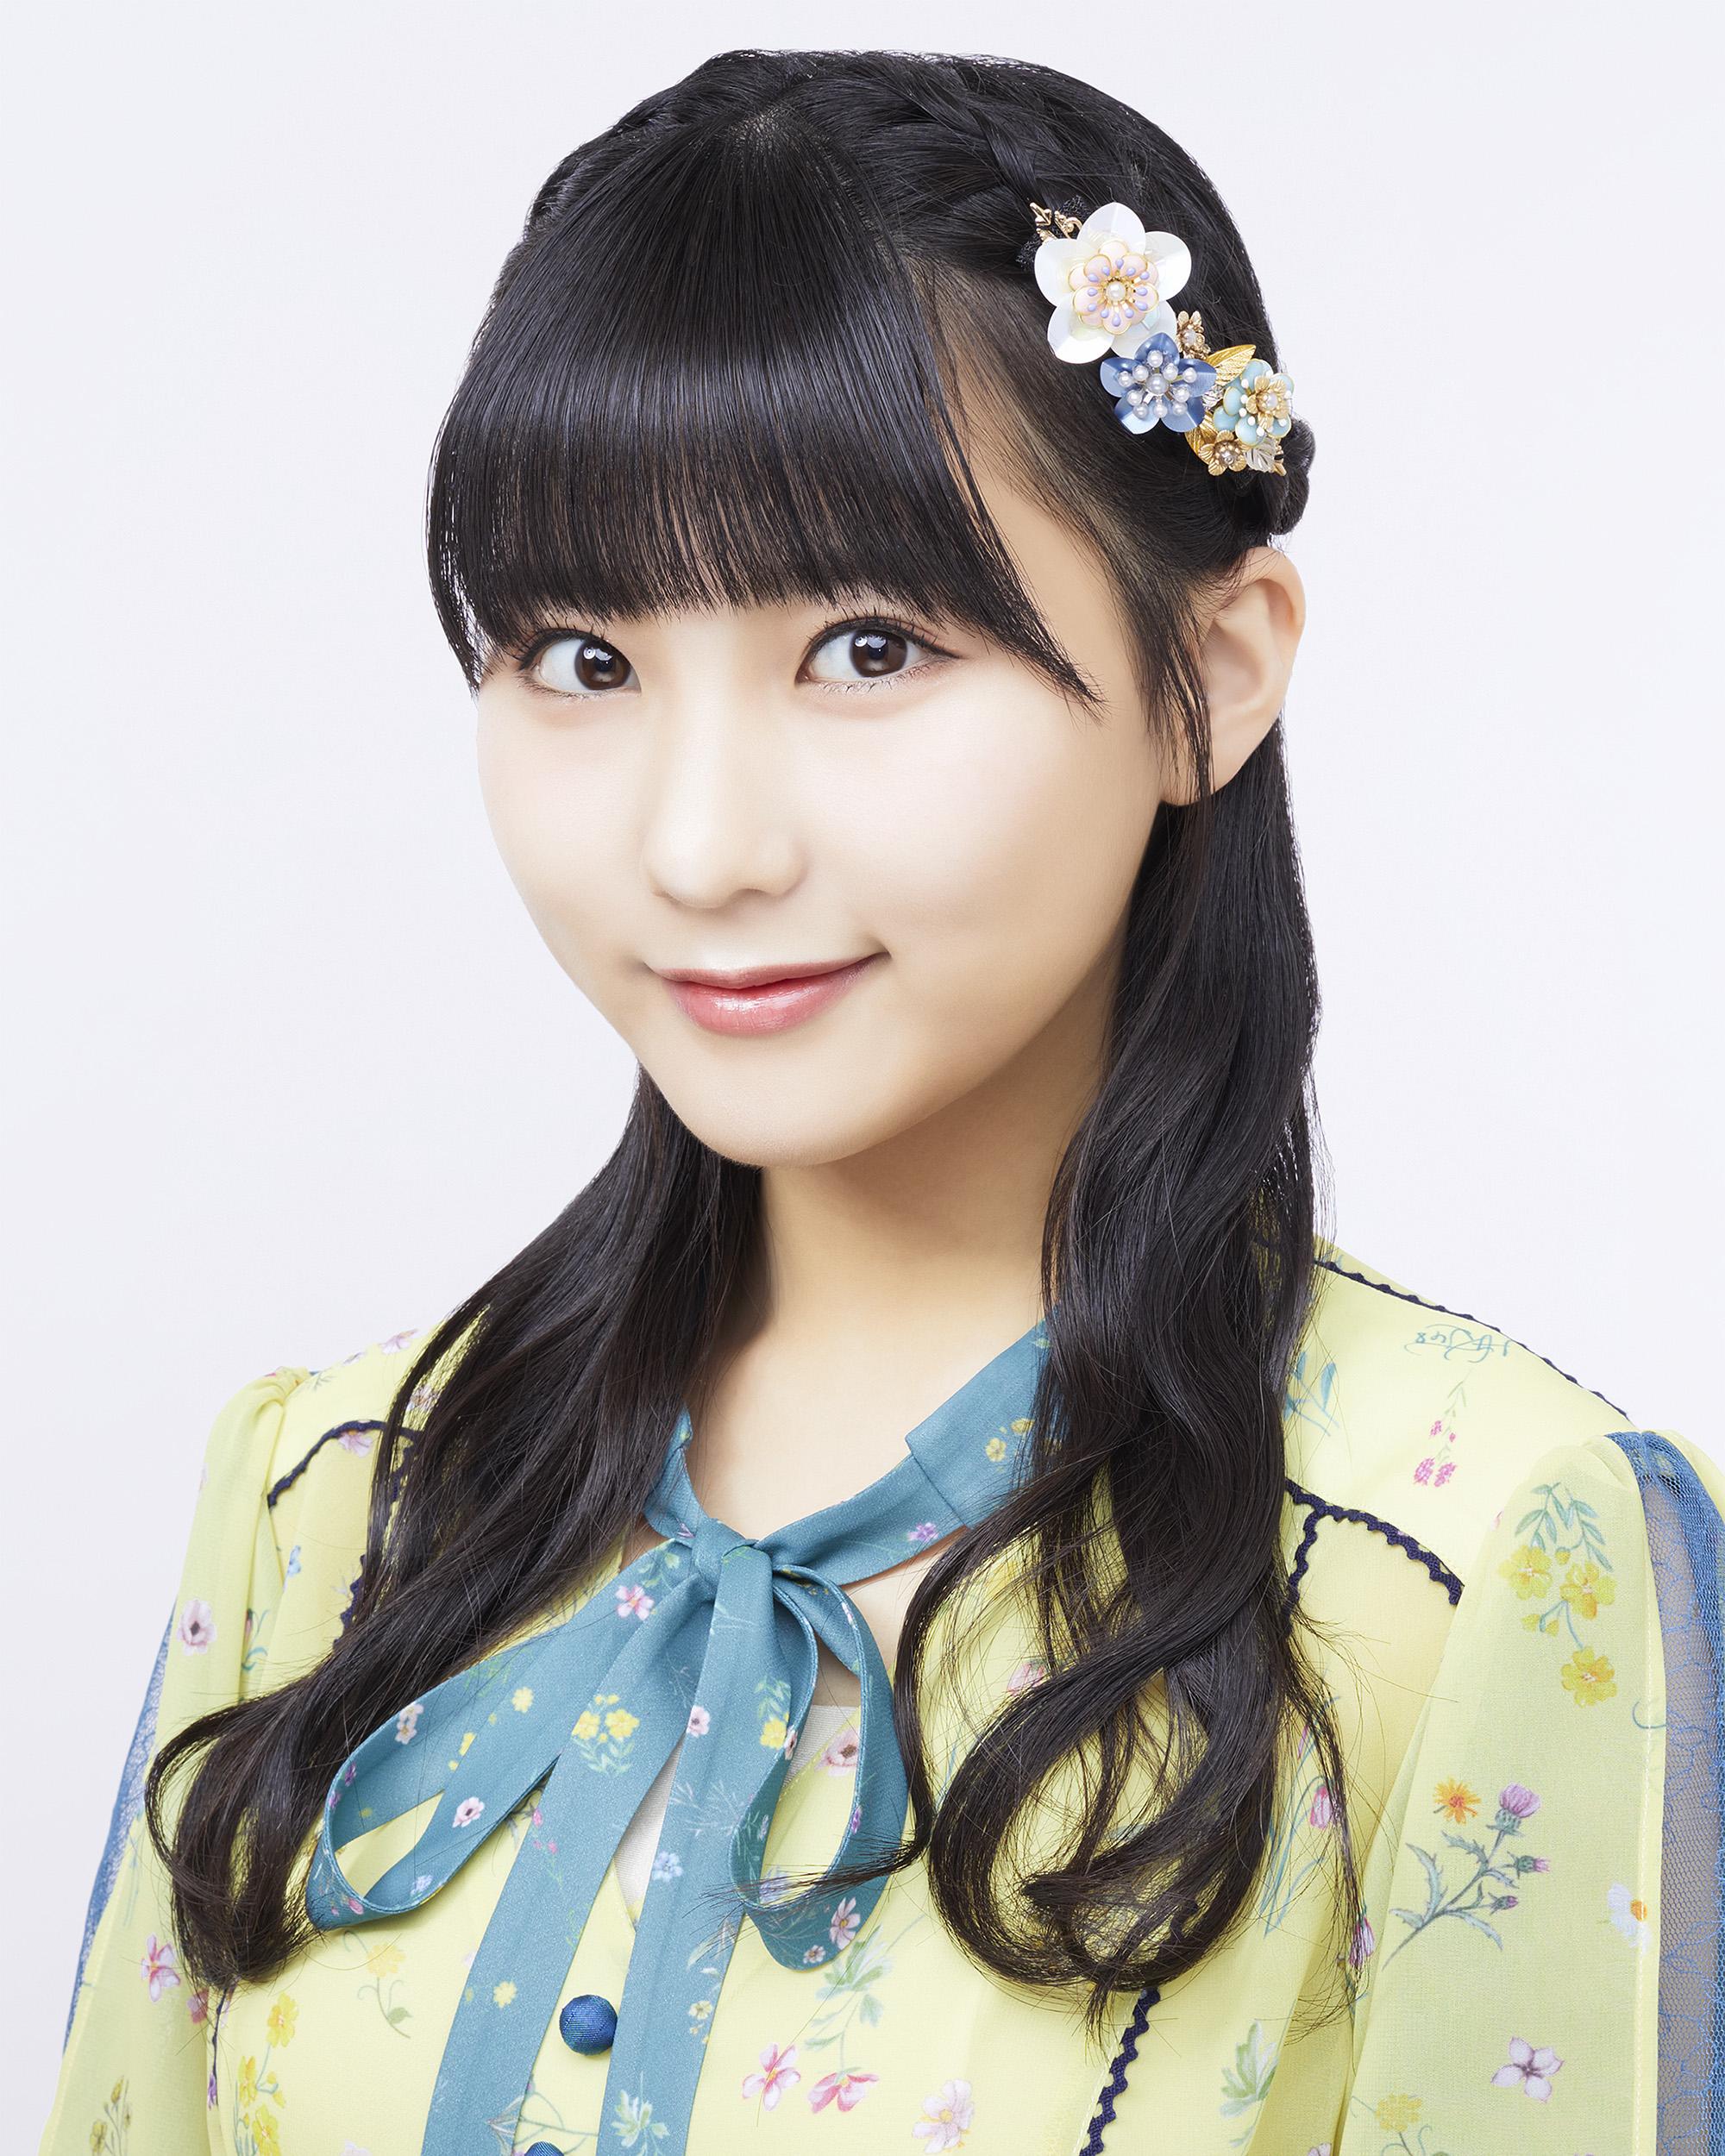 田中美久(HKT48 Team H)